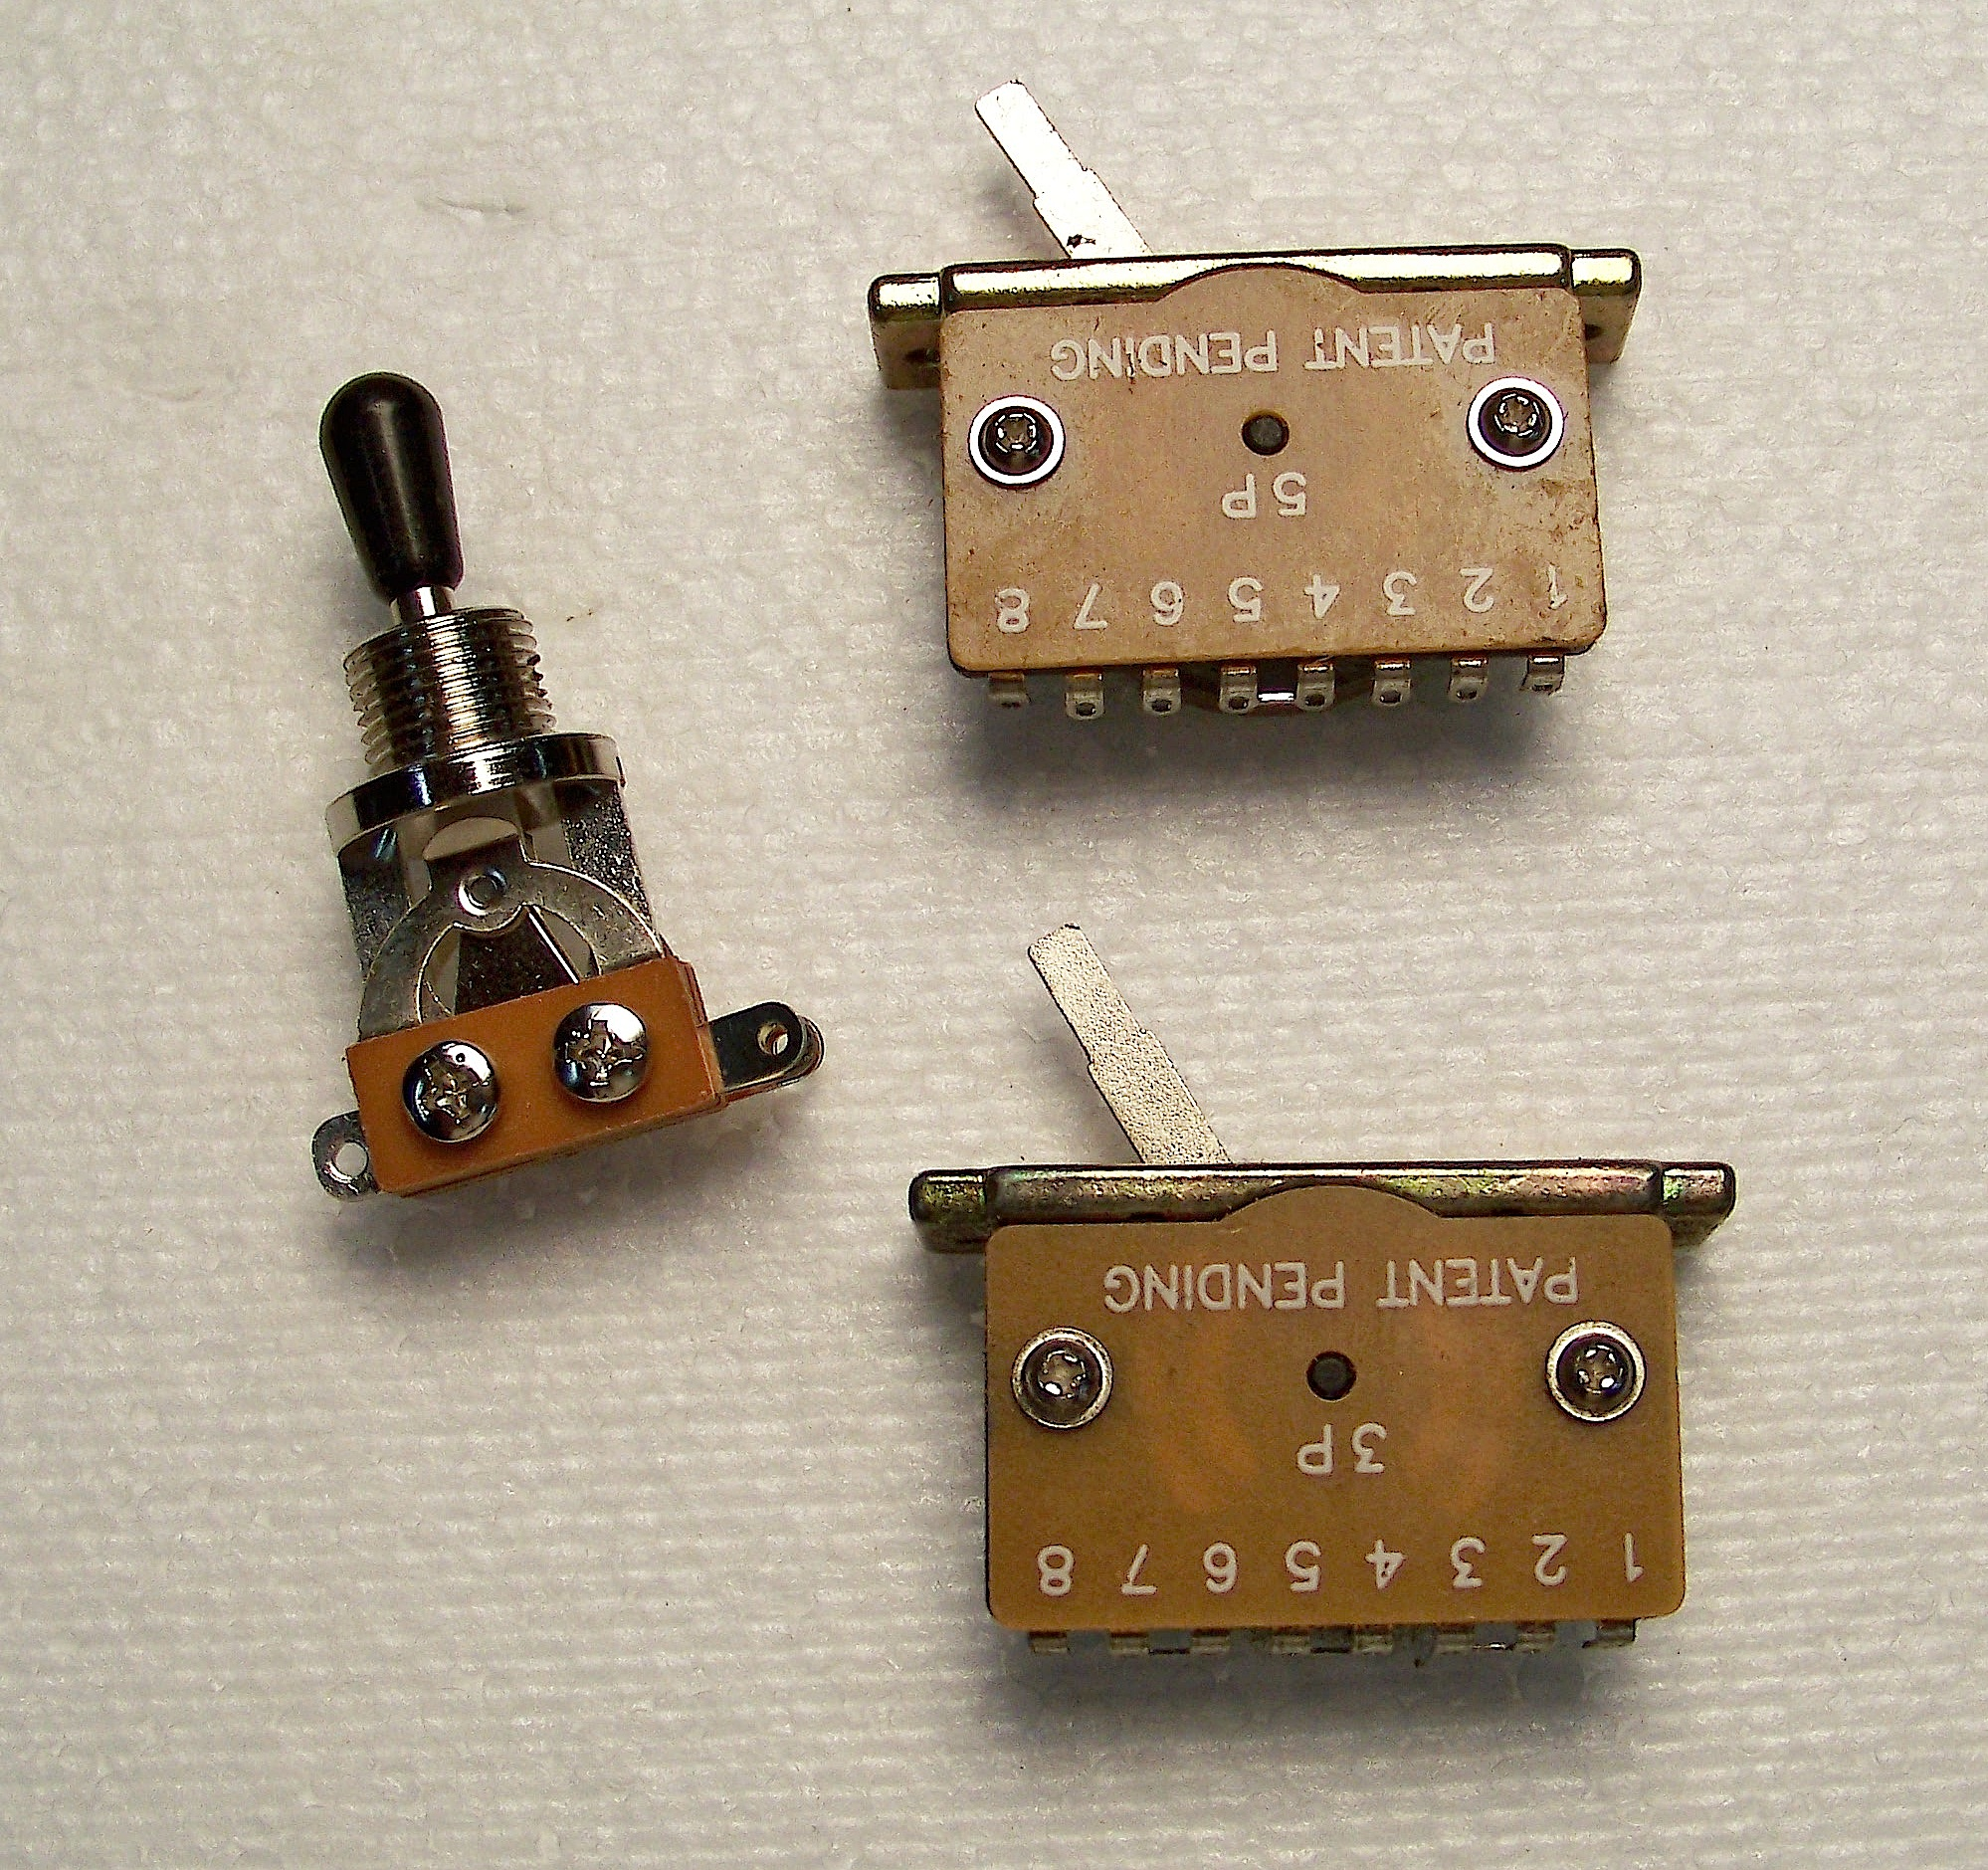 Phantom Guitarworks Parts Plus Accessories Phantom Teardrop - 5 Way Switch Guitar